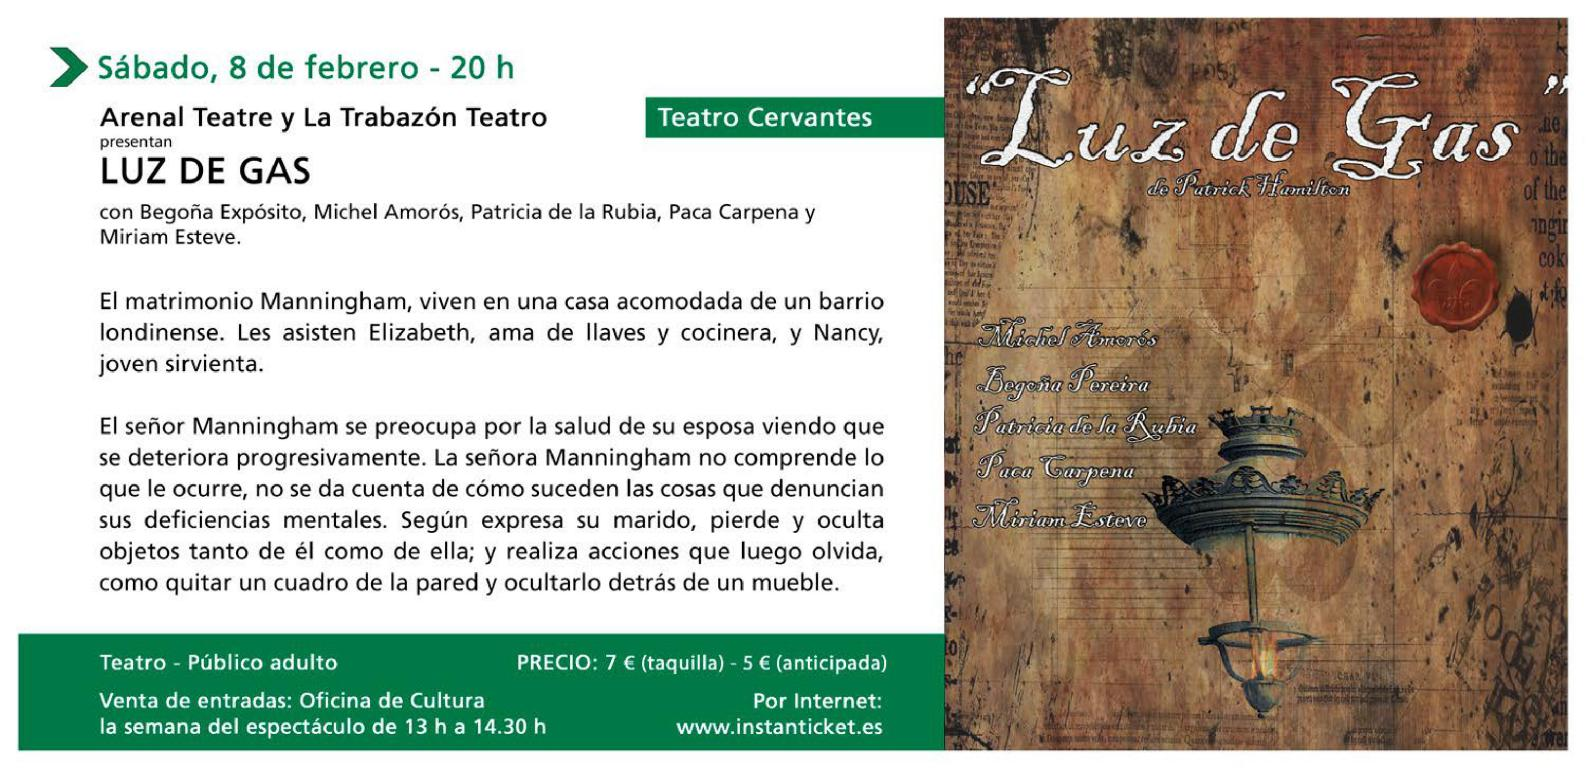 Programacin-Teatro-Cervantes-2020_page-0004.jpg